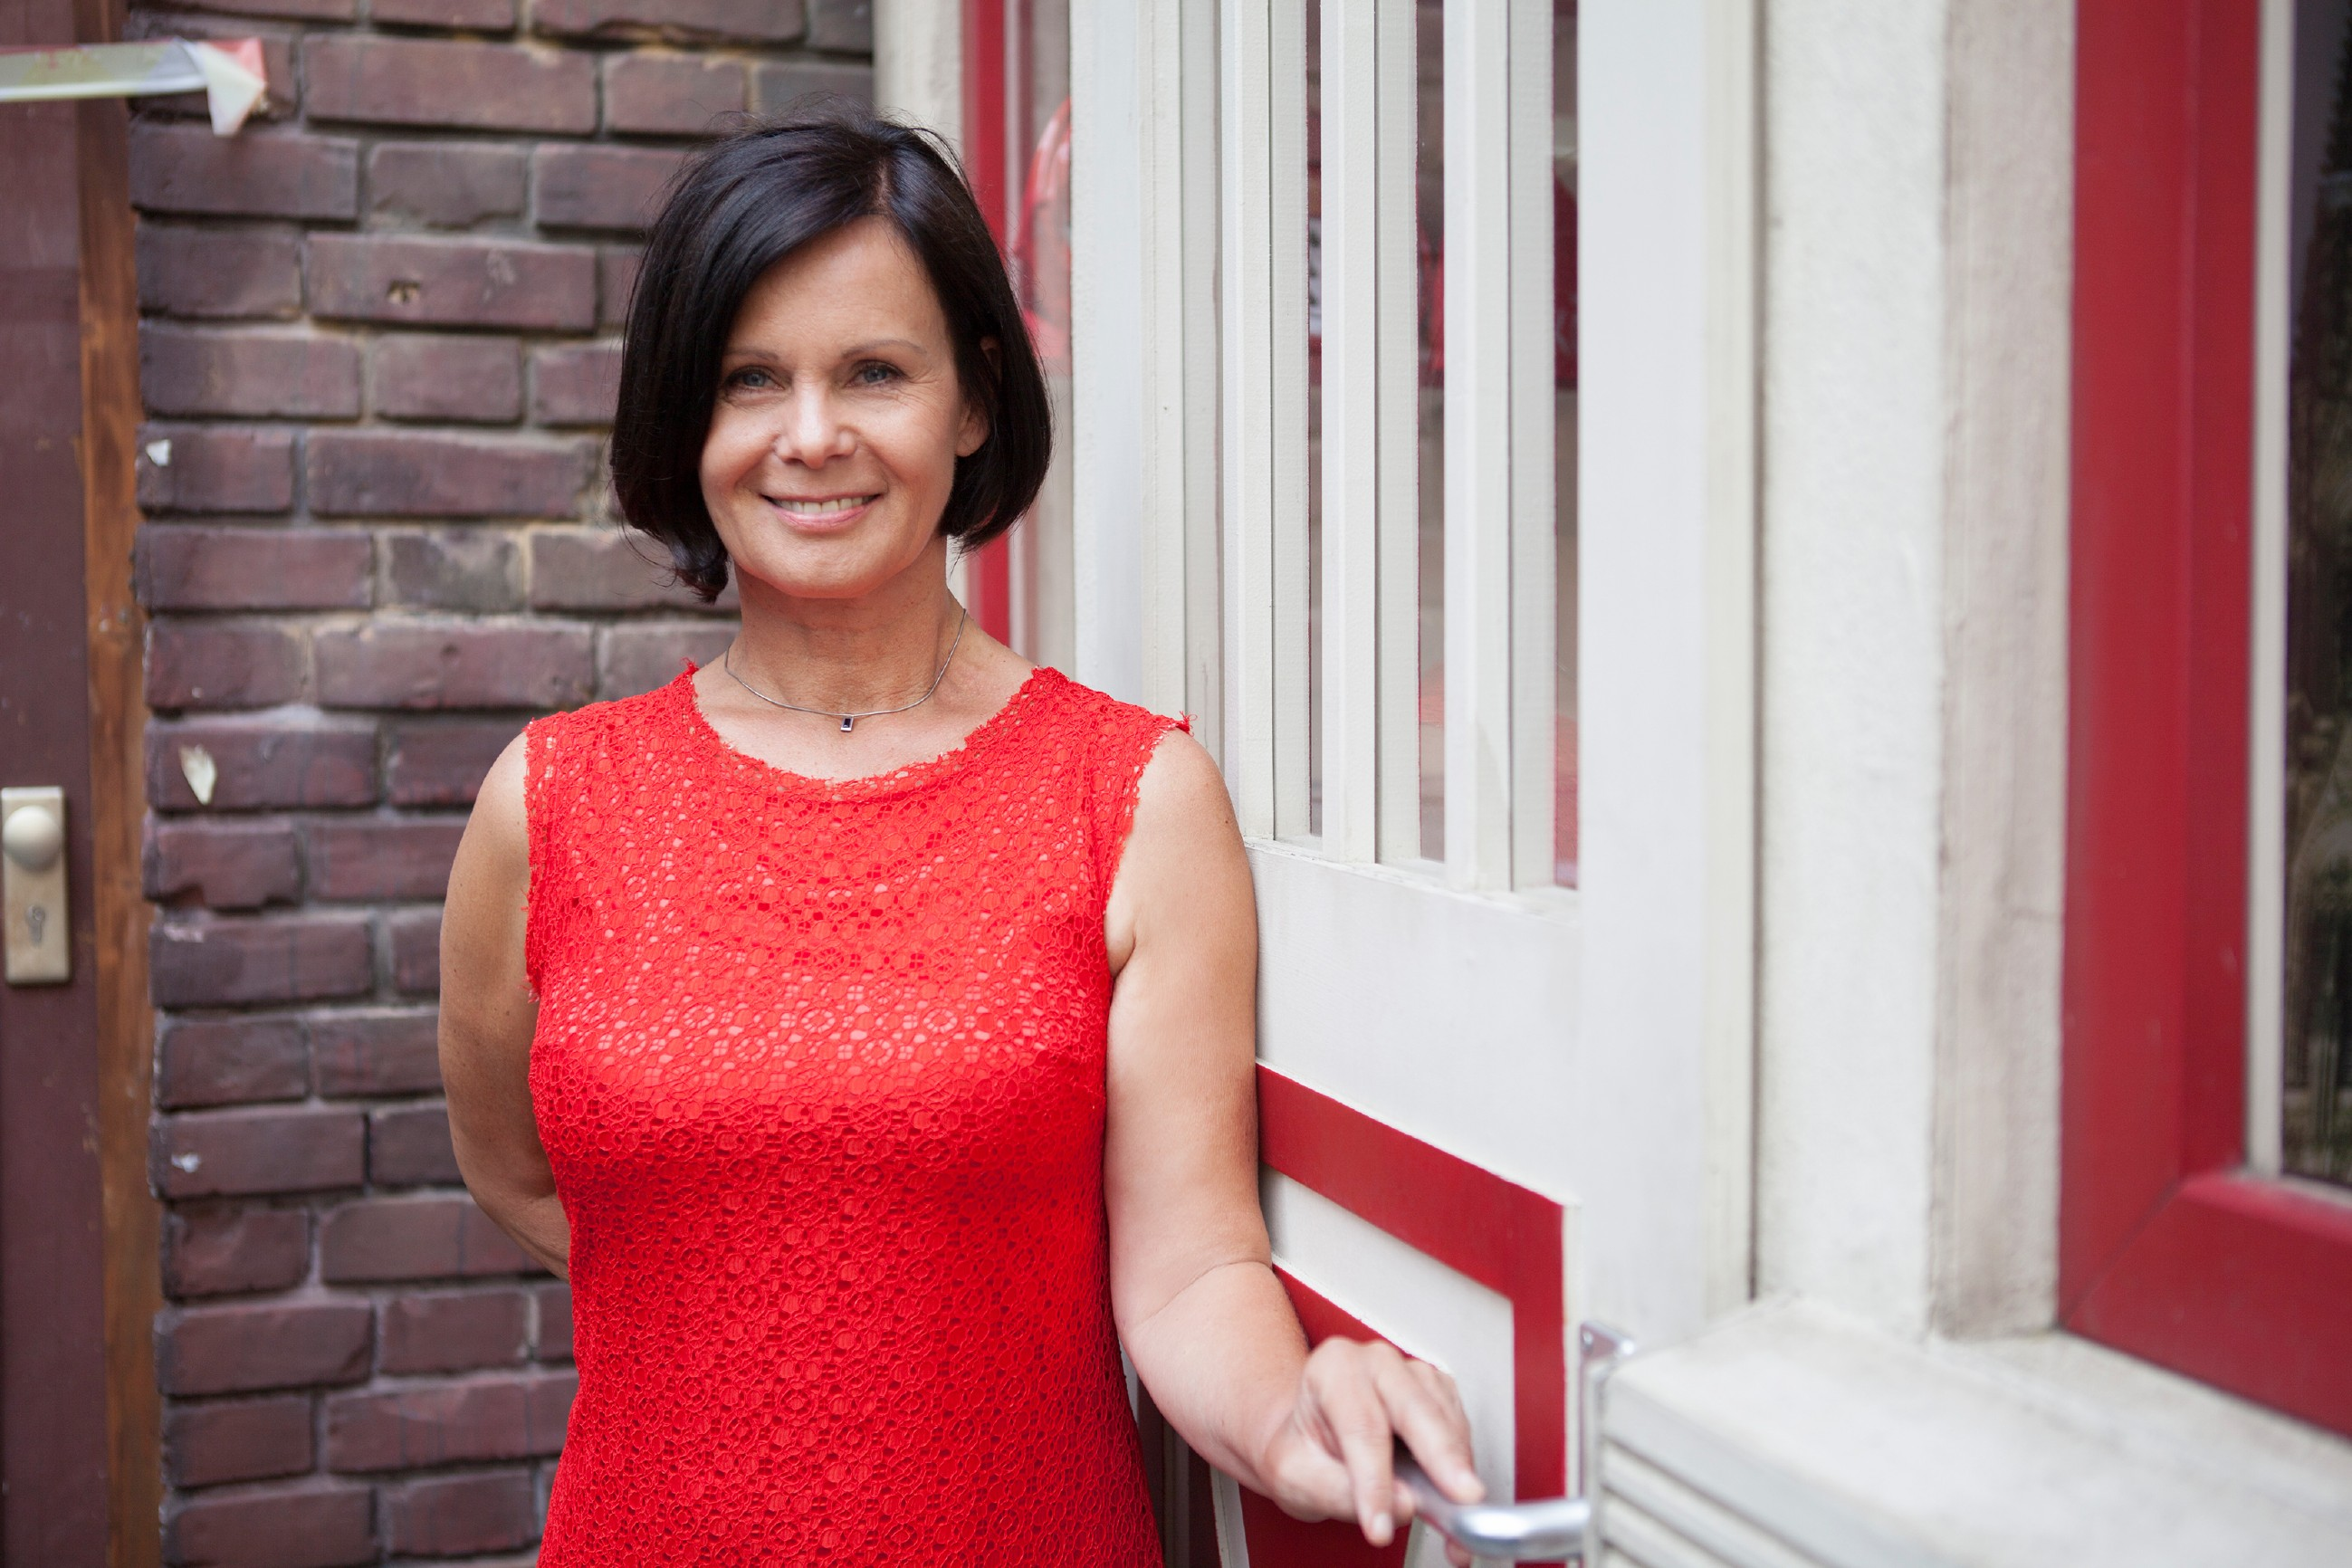 Petra Blossey (Quelle: RTL / Kirstin Günther)